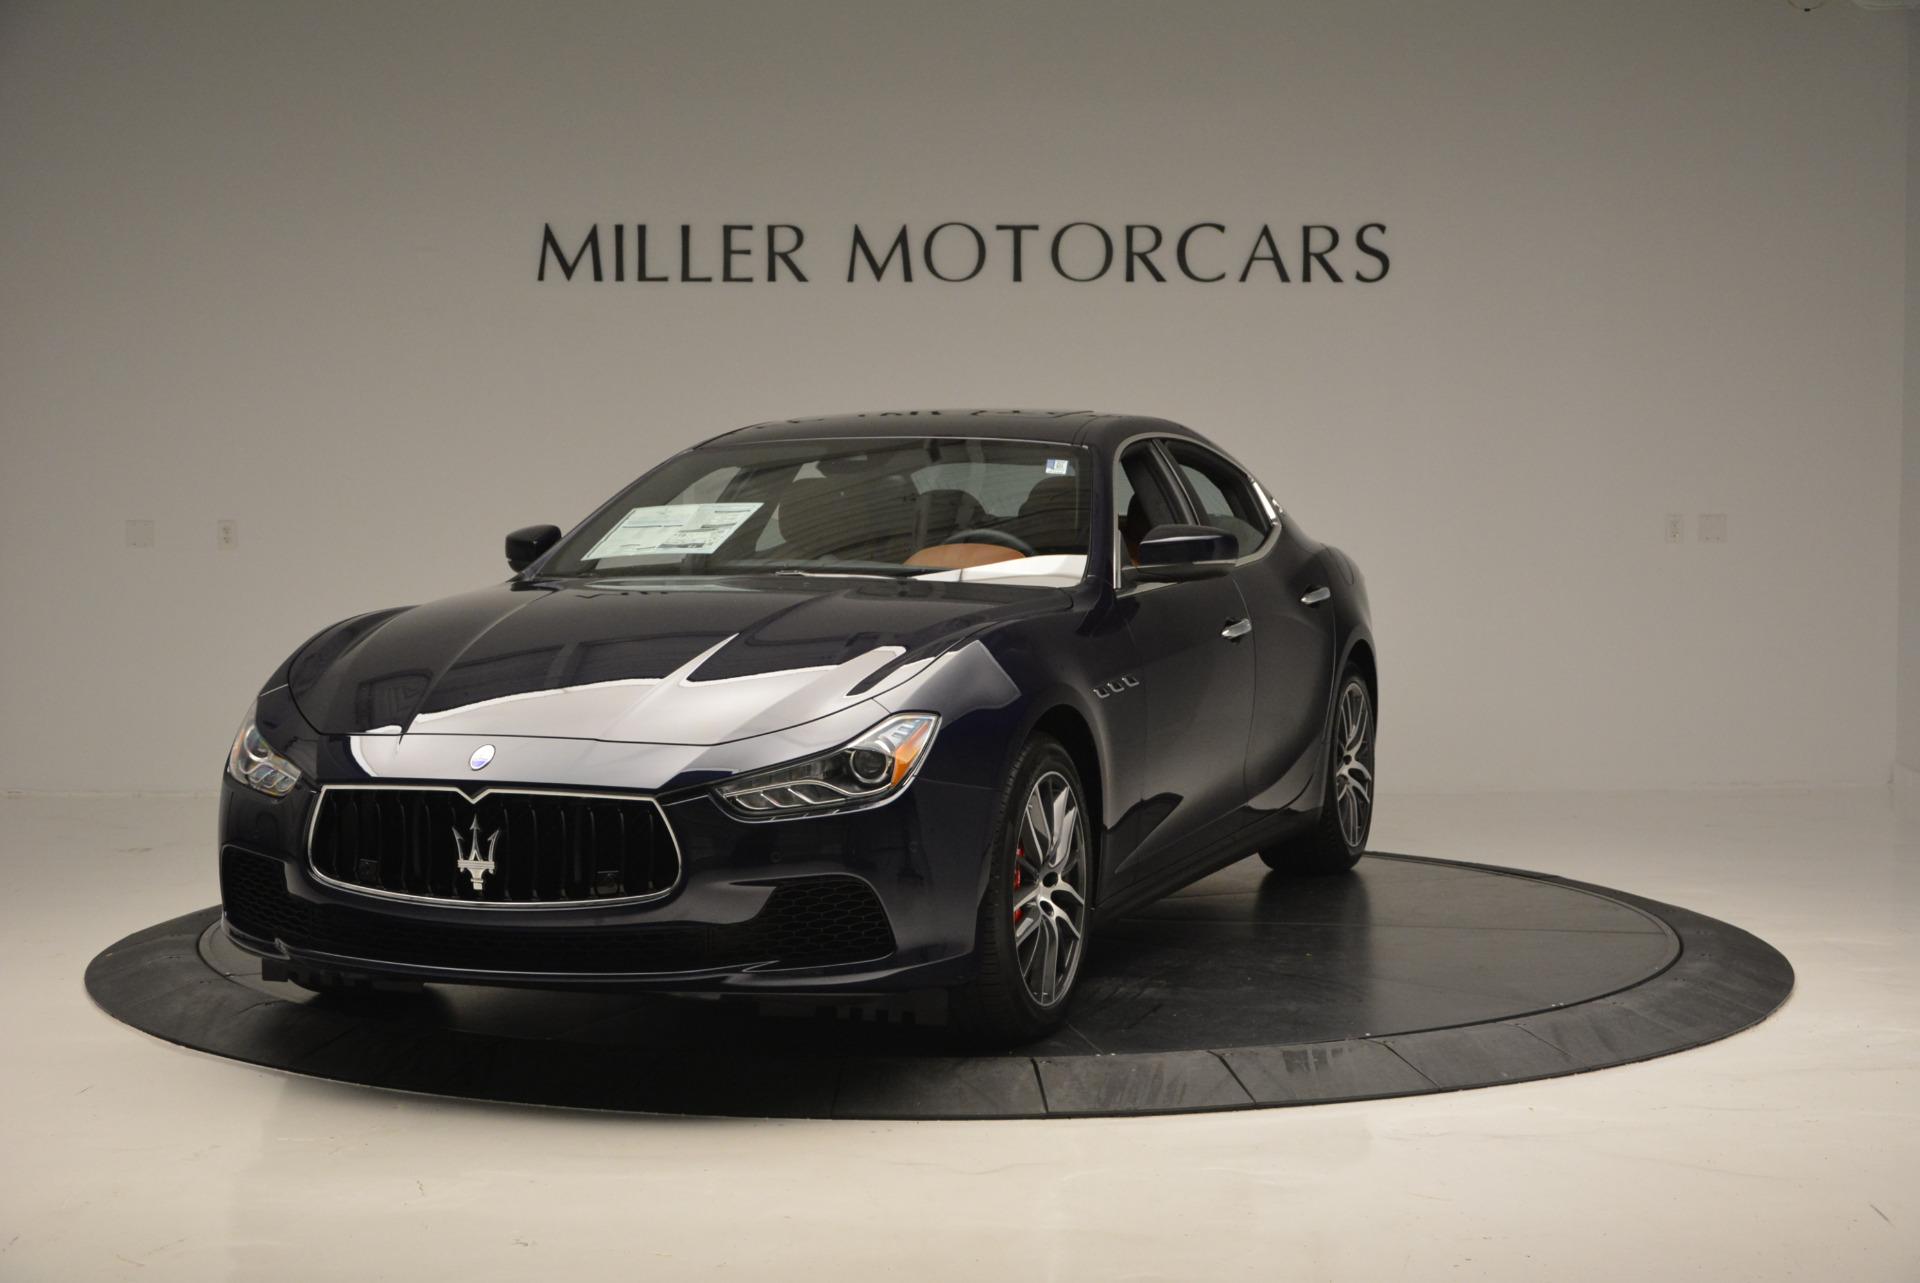 New 2017 Maserati Ghibli S Q4 For Sale In Greenwich, CT 569_main